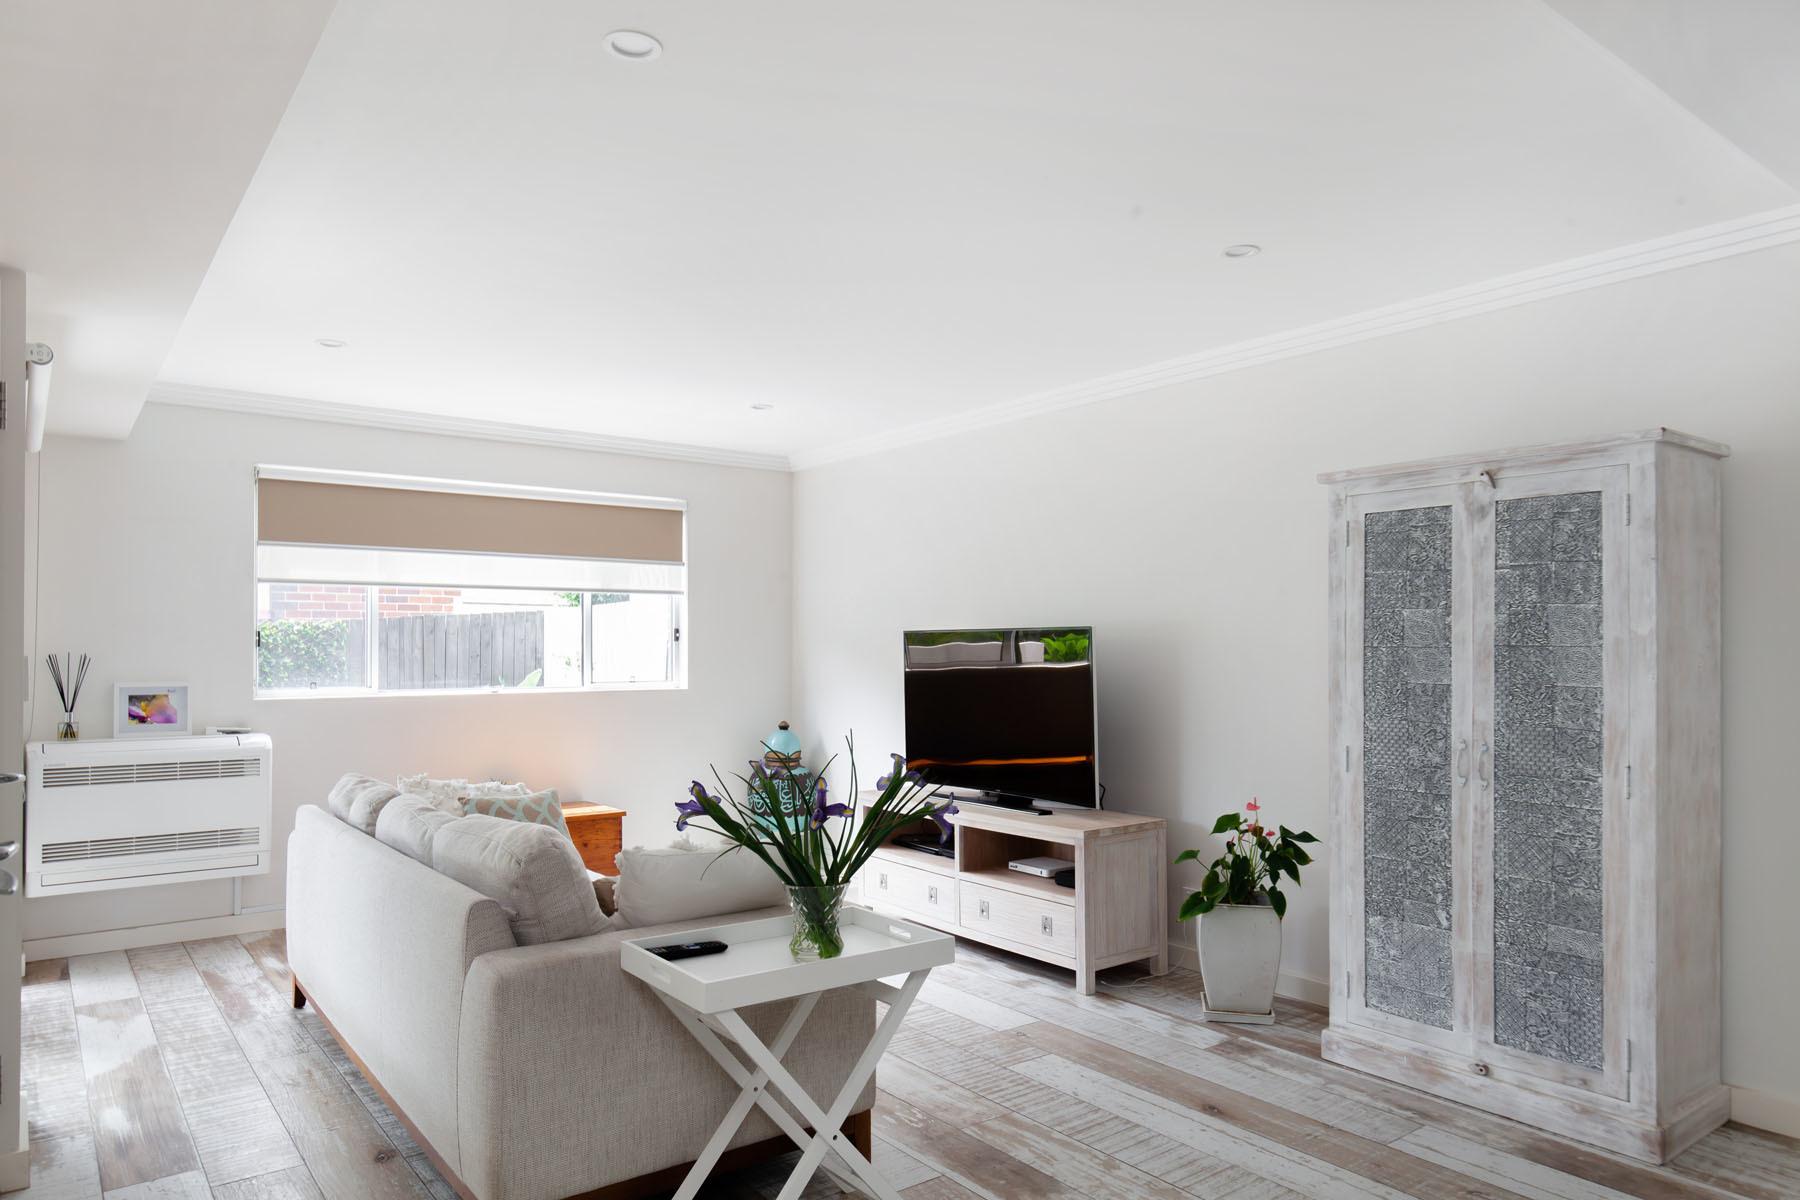 Modern Ground Floor Apartment With Plentiful Outdoor Space